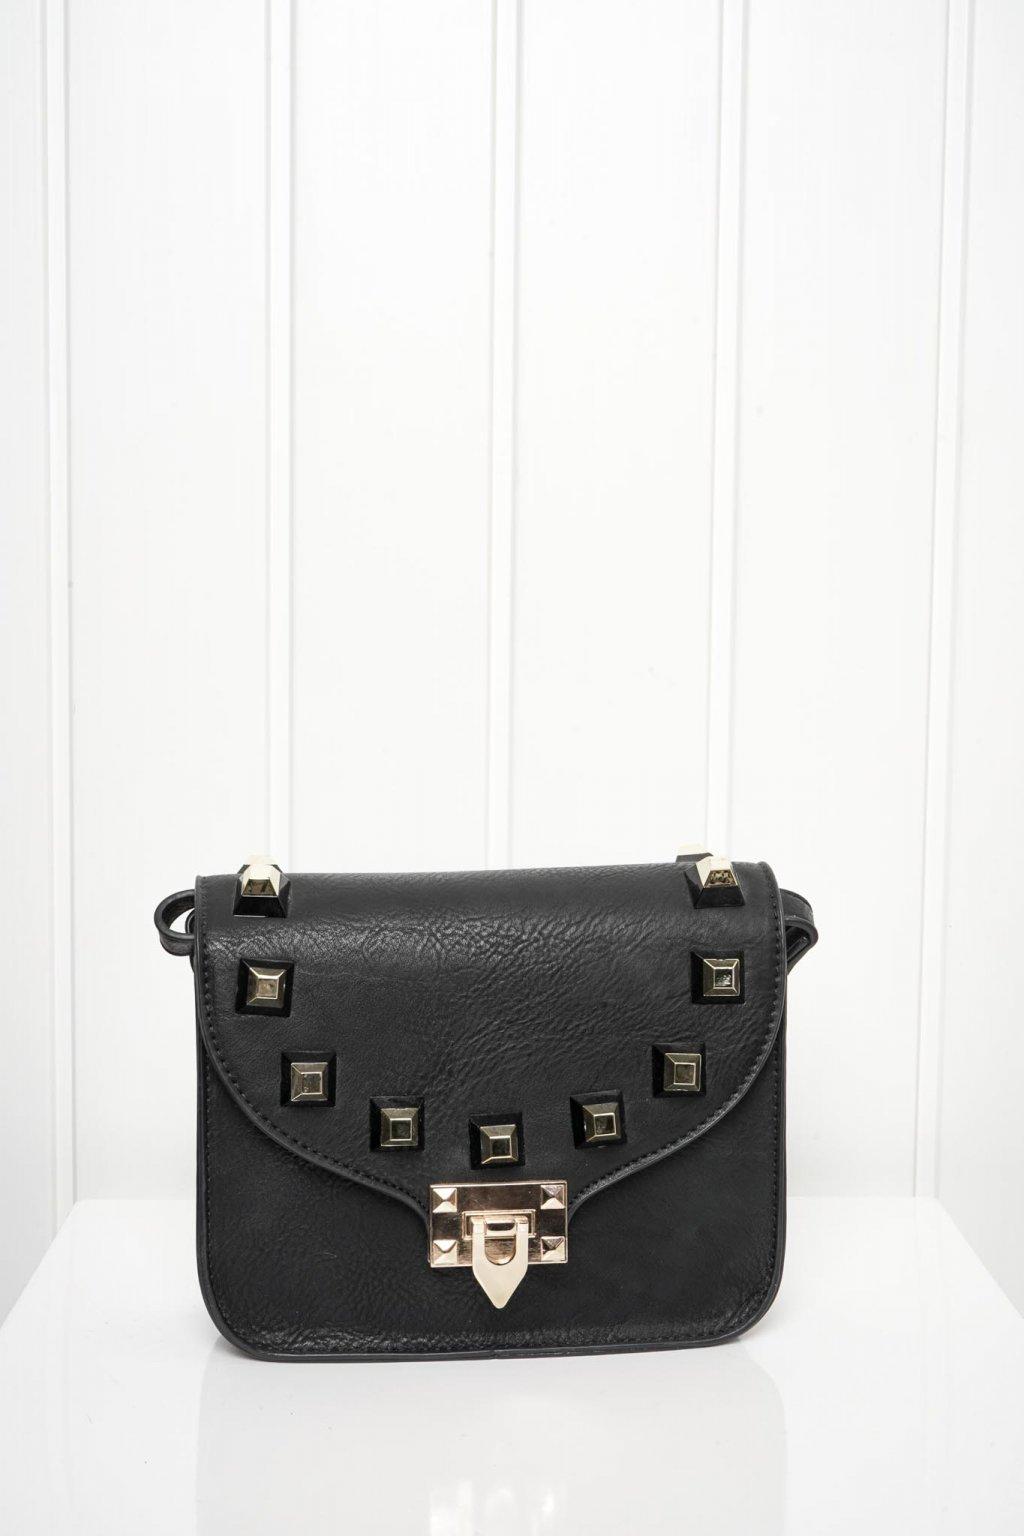 Kabelka, crossbody, ruksak, shopping bag, shopperka, 225